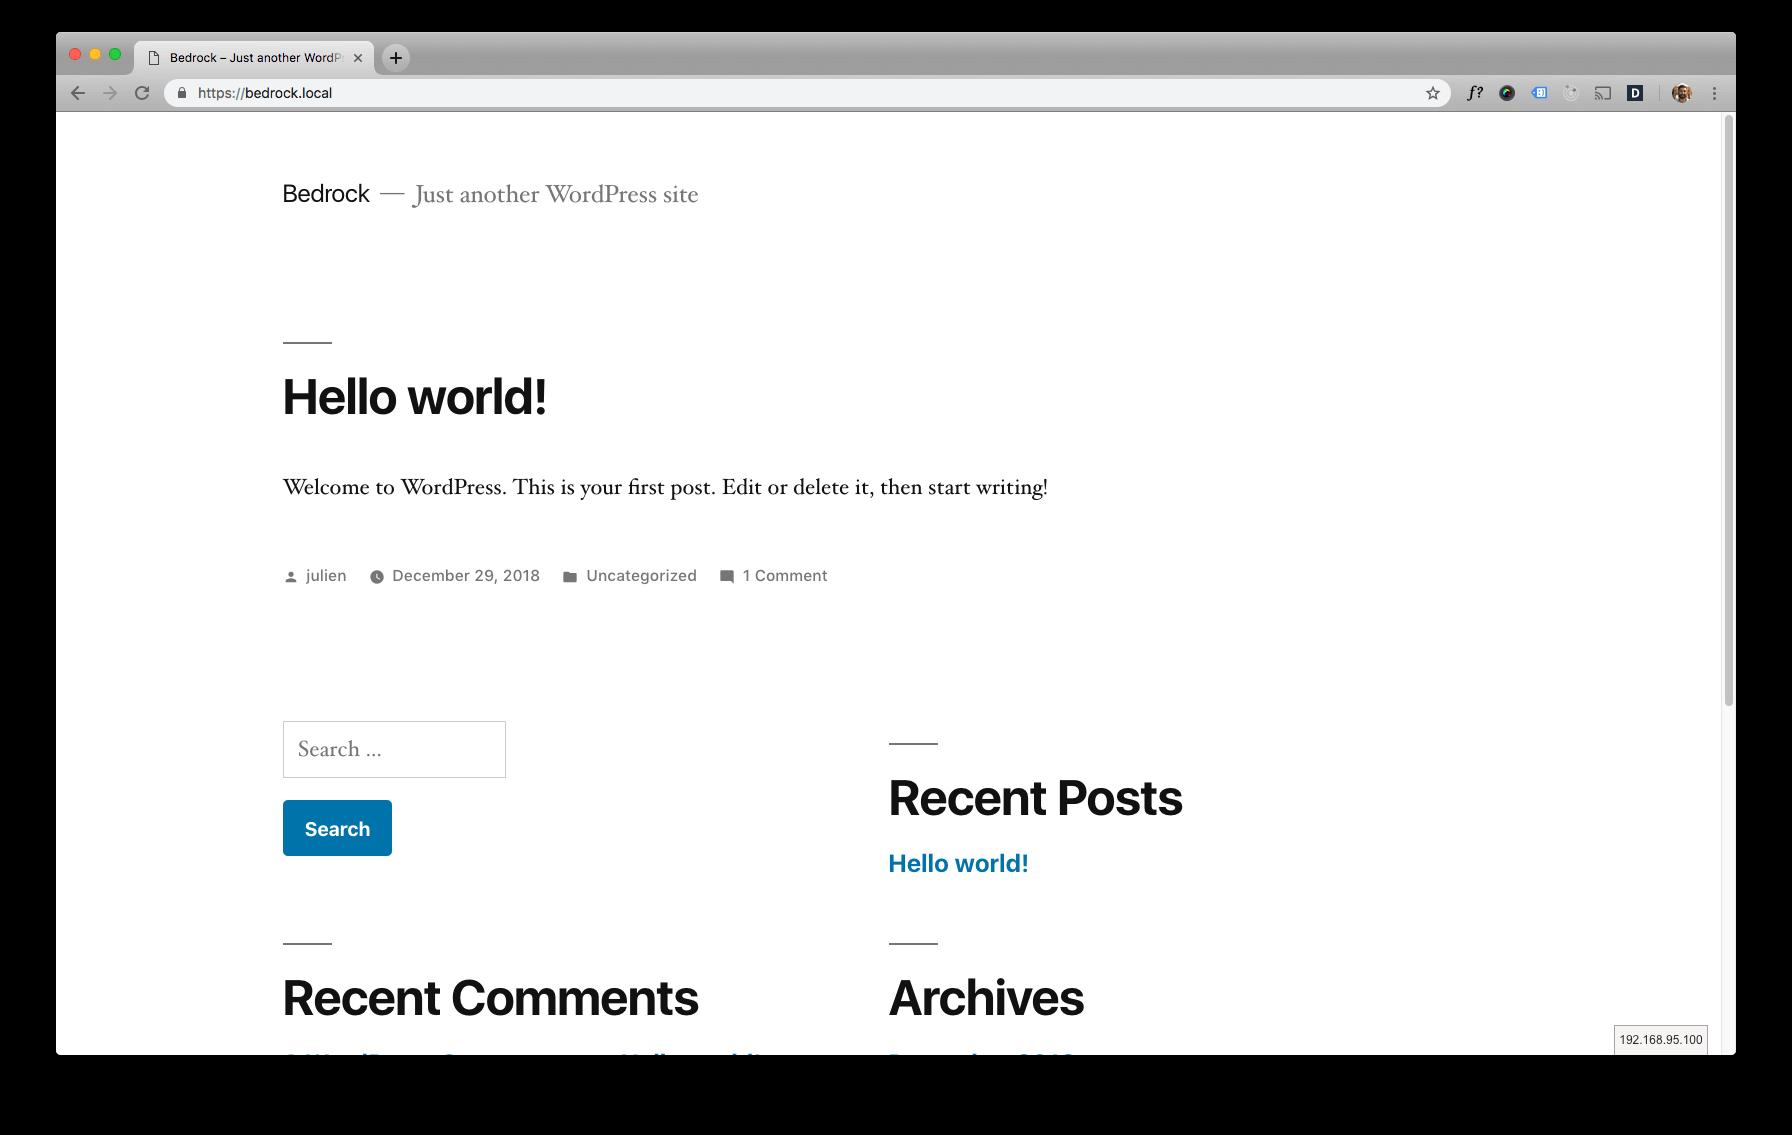 Screenshot of the Bedrock WordPress site in Google Chrome